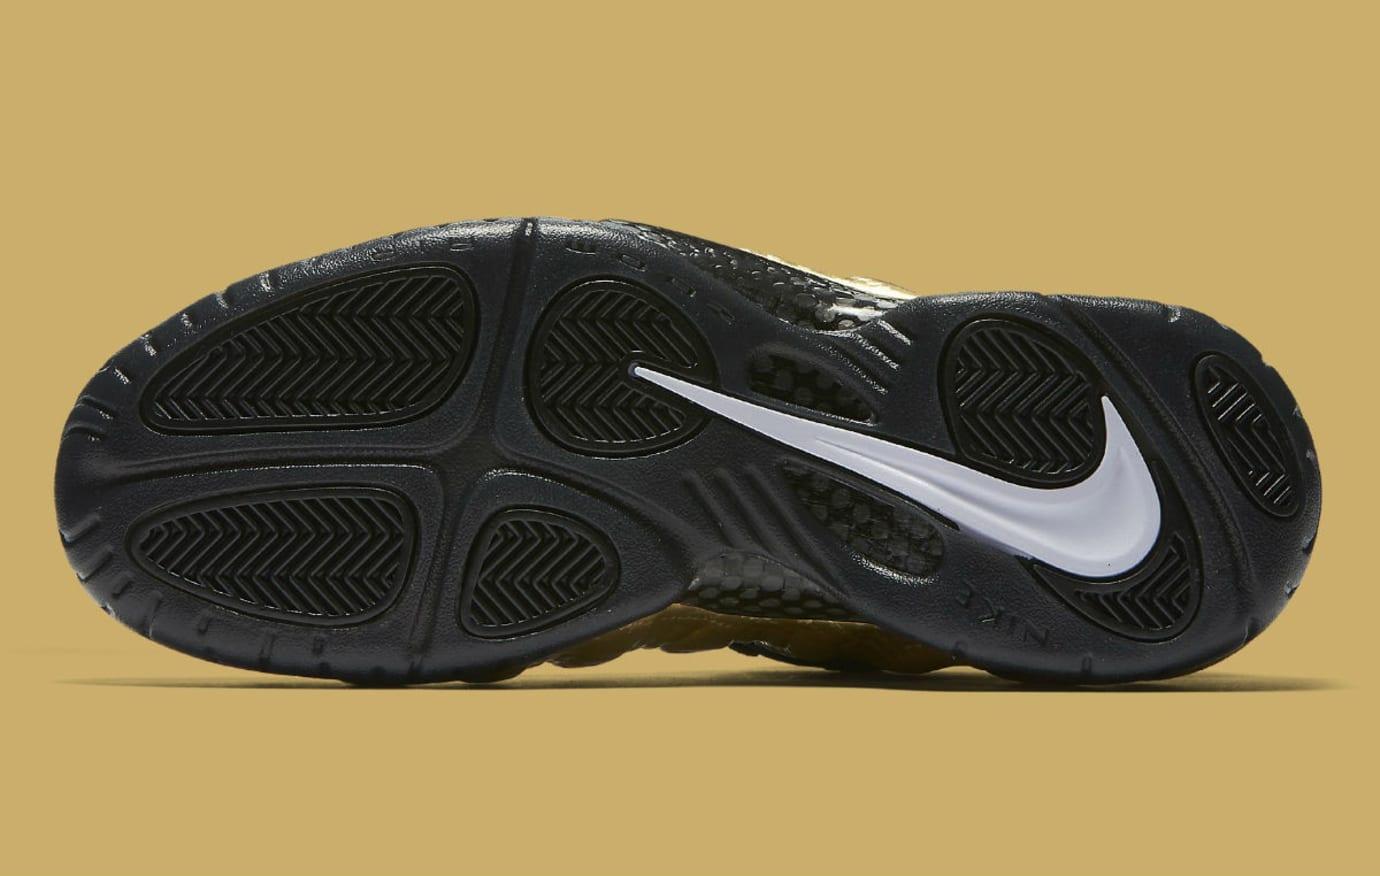 5bcdc479ad5 Nike Air Foamposite Pro Metallic Gold Release Date Sole 624041-701